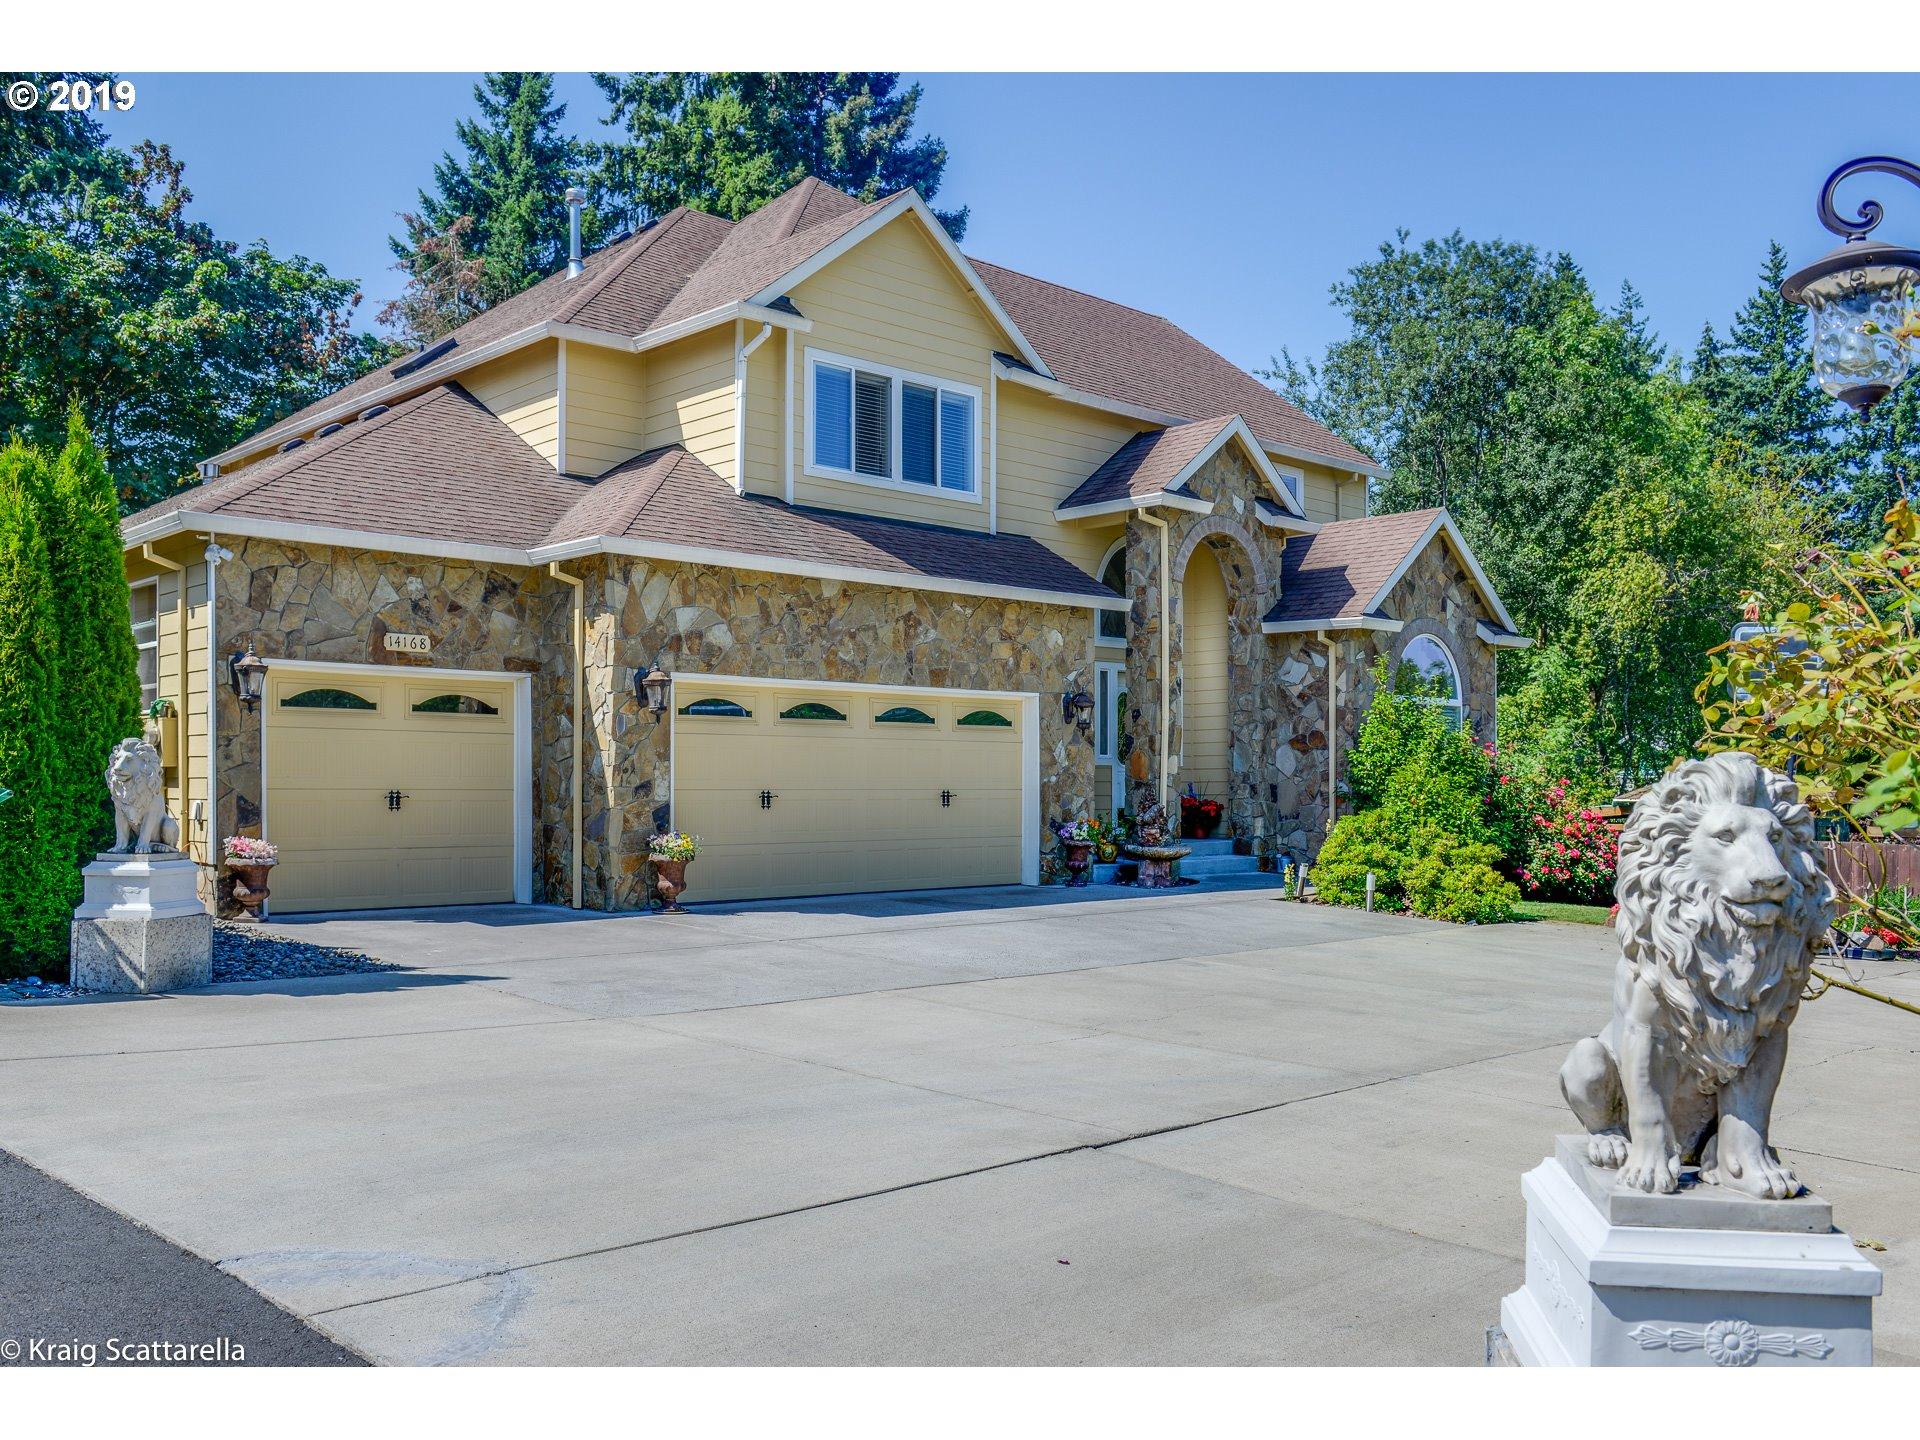 Photo of 14168 NW PIONEER RD, Beaverton, OR 97006